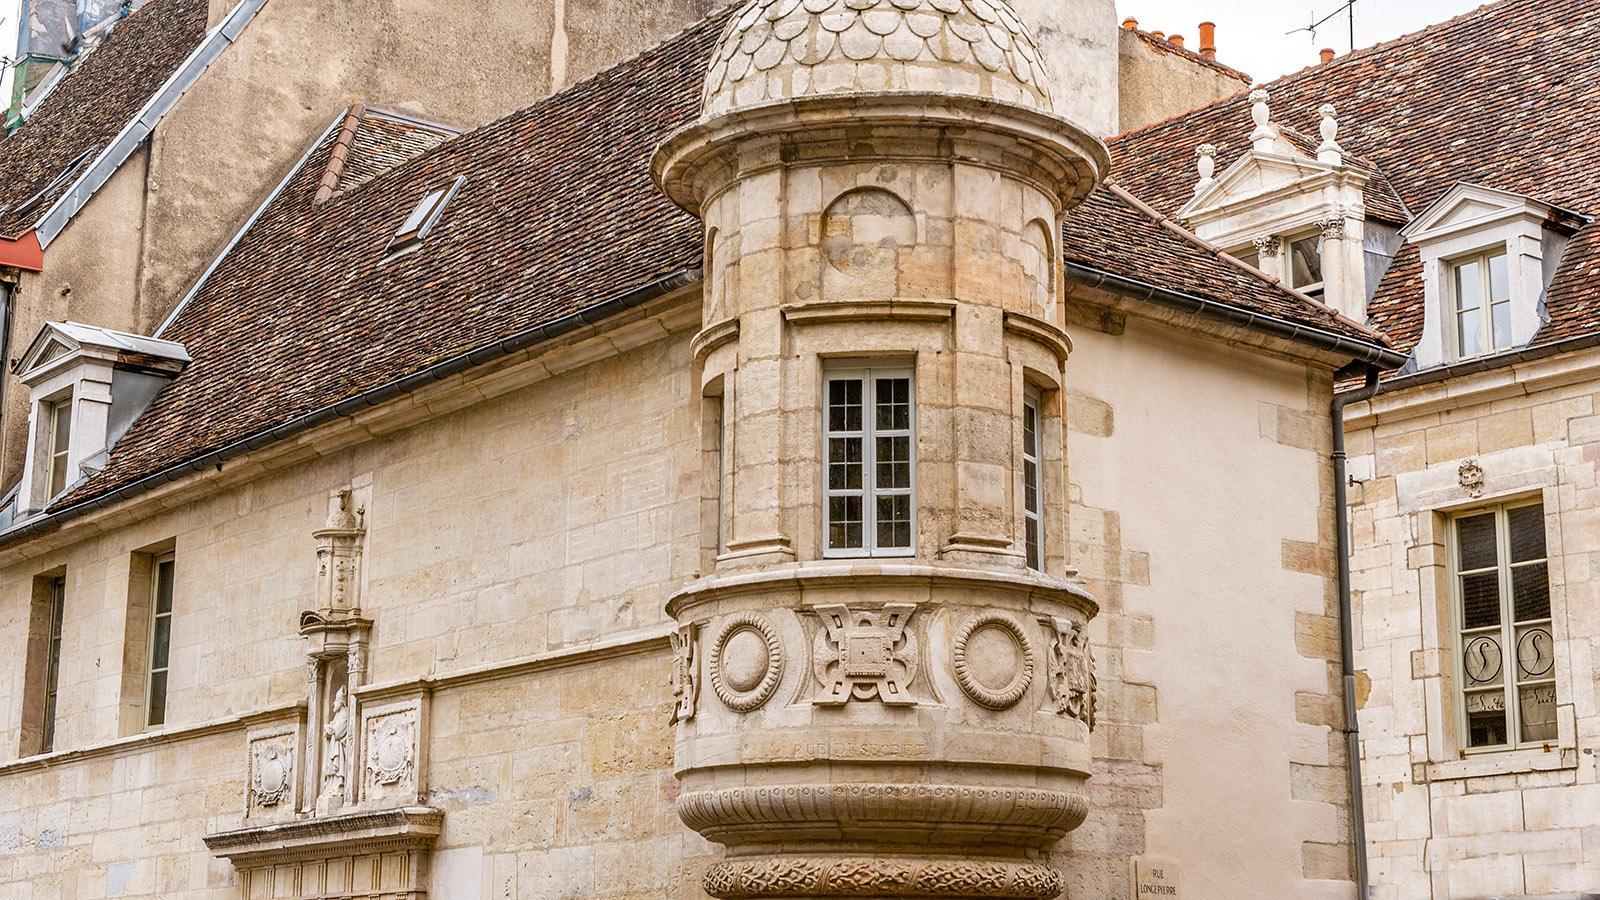 Dijon: kunstvoller Erker an einem Stadtpalais. Foto: Hilke Maunder